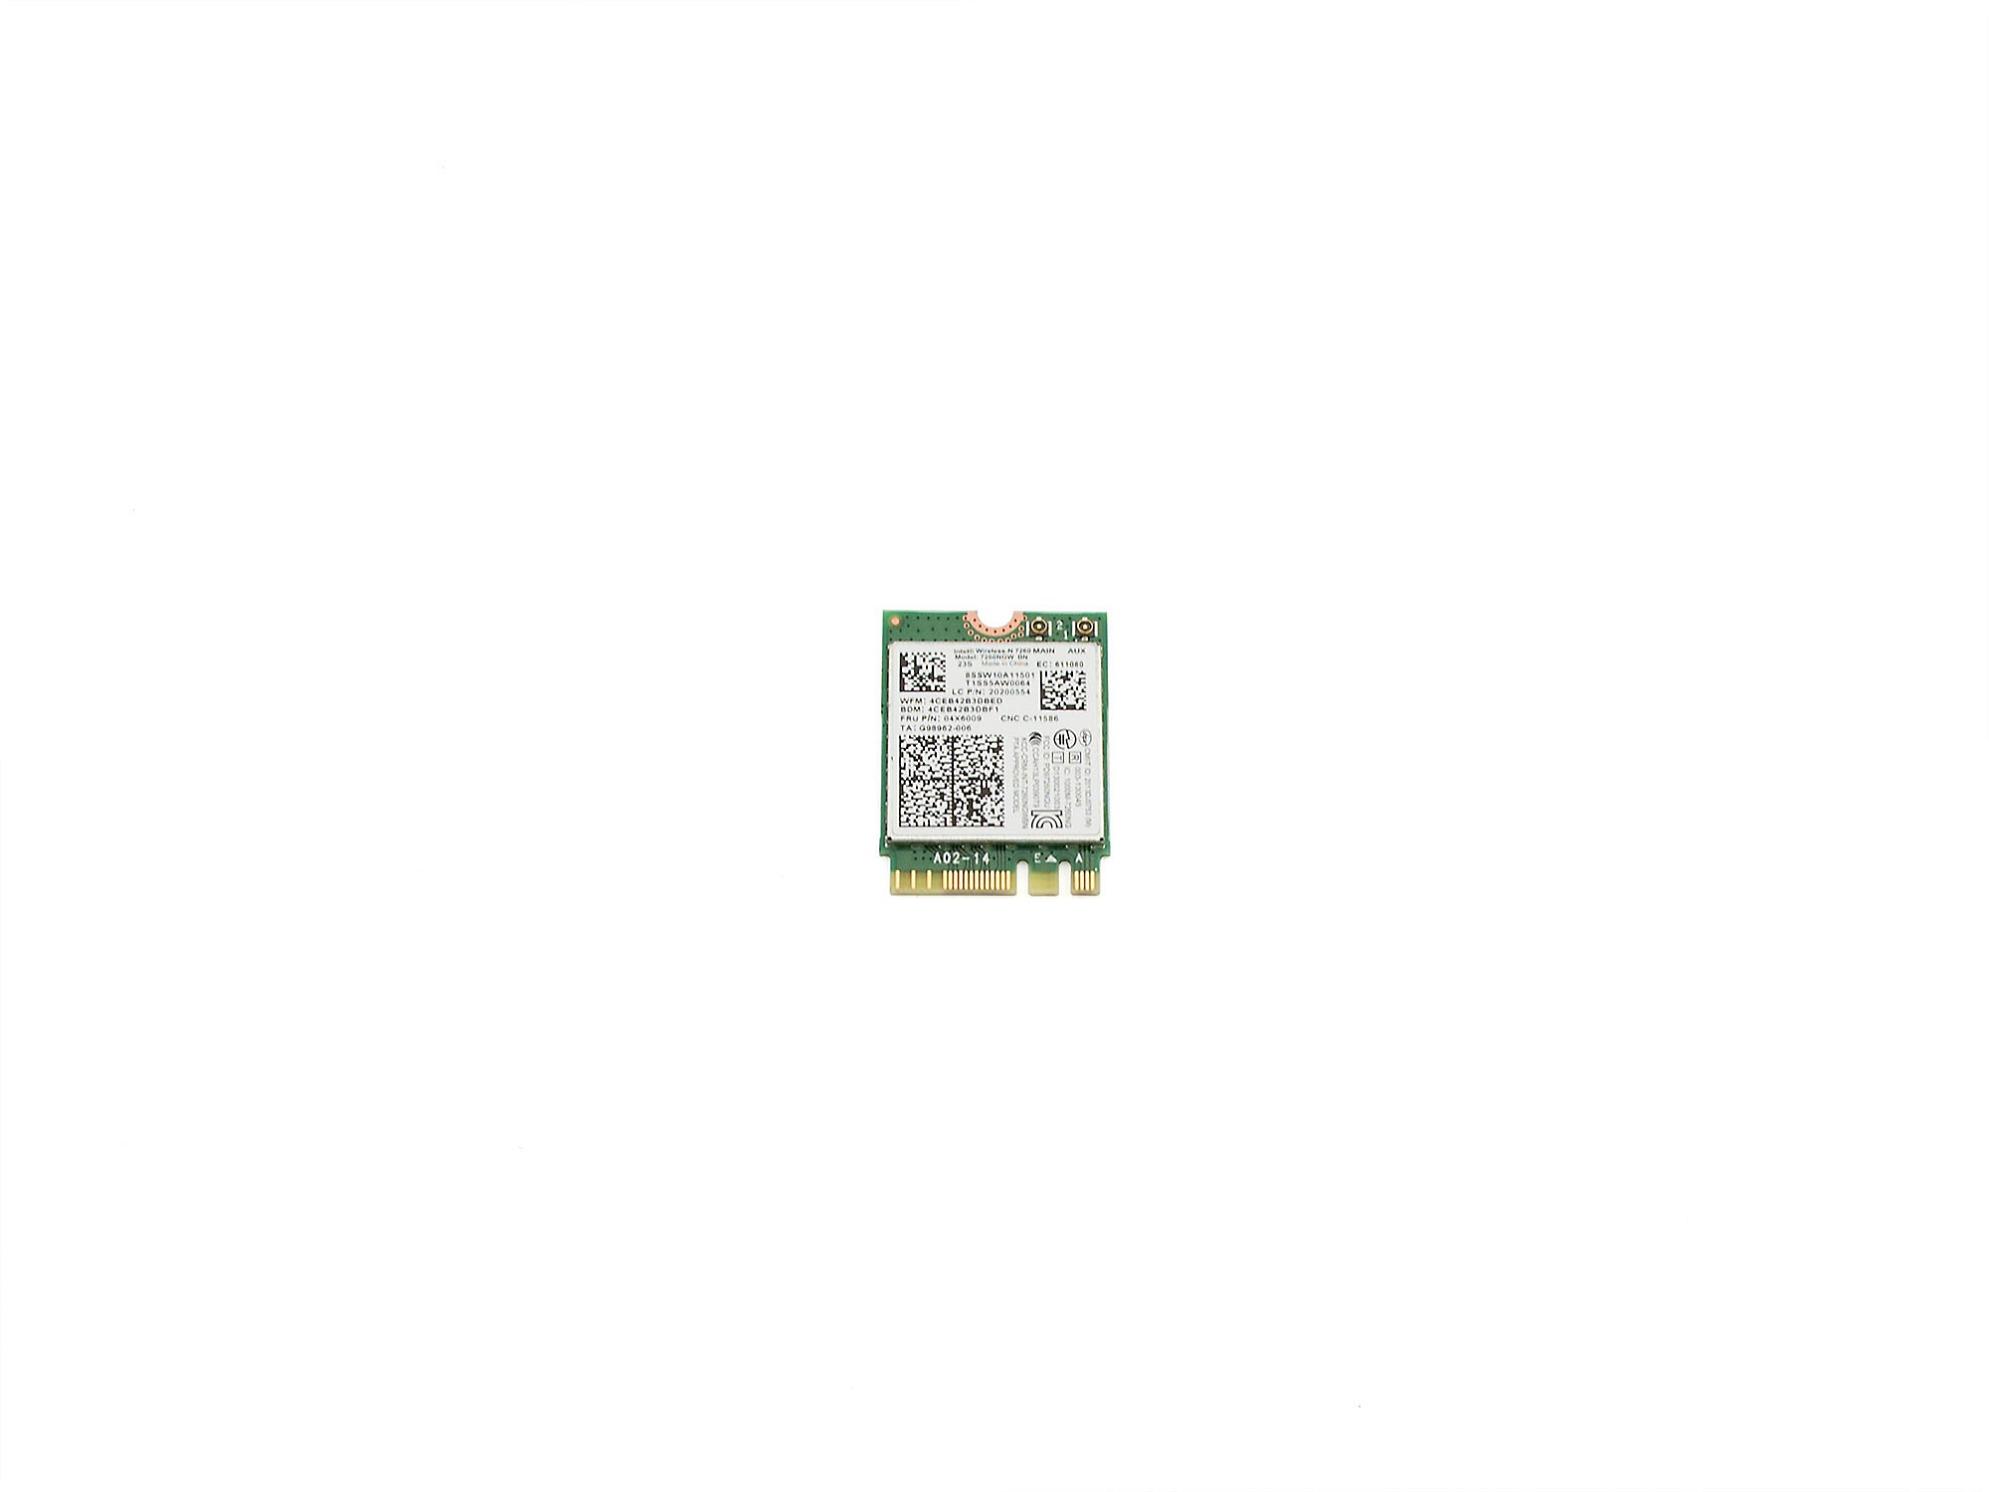 Intel Wireless-N 7260 MAIN für Lenovo ThinkPad W540 Serie